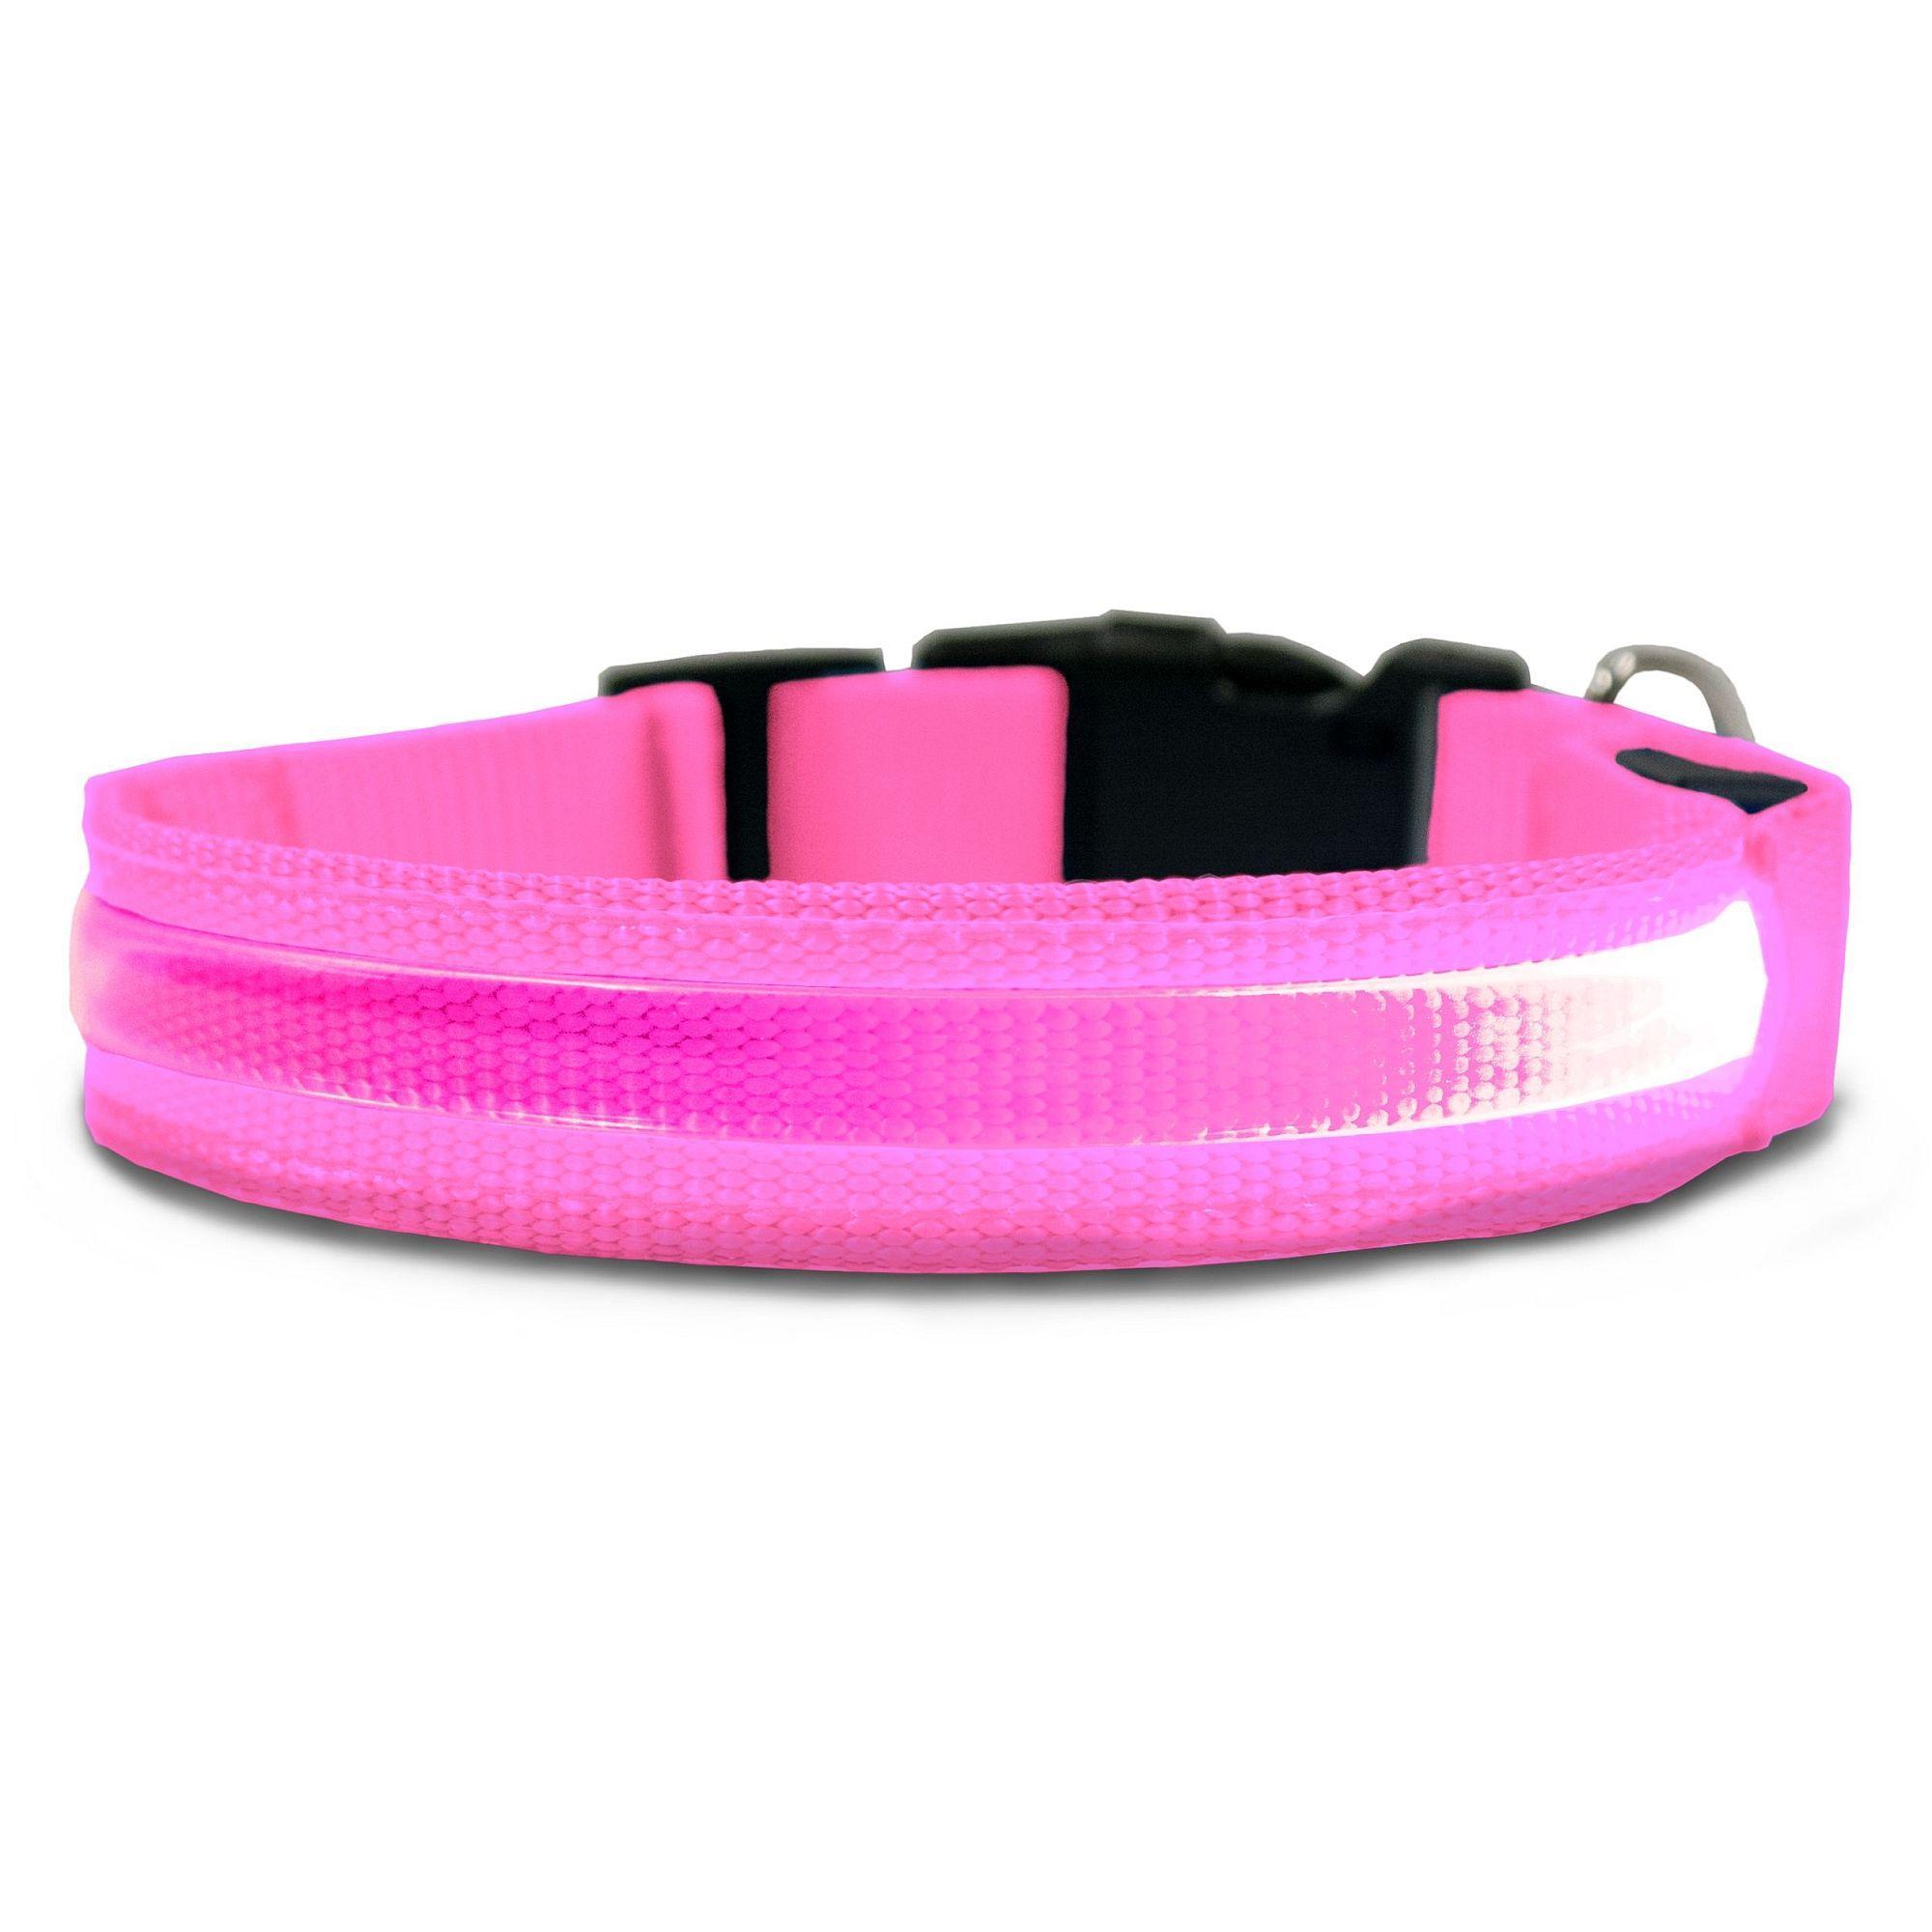 FurHaven LED Safety Pet Collar - Pink